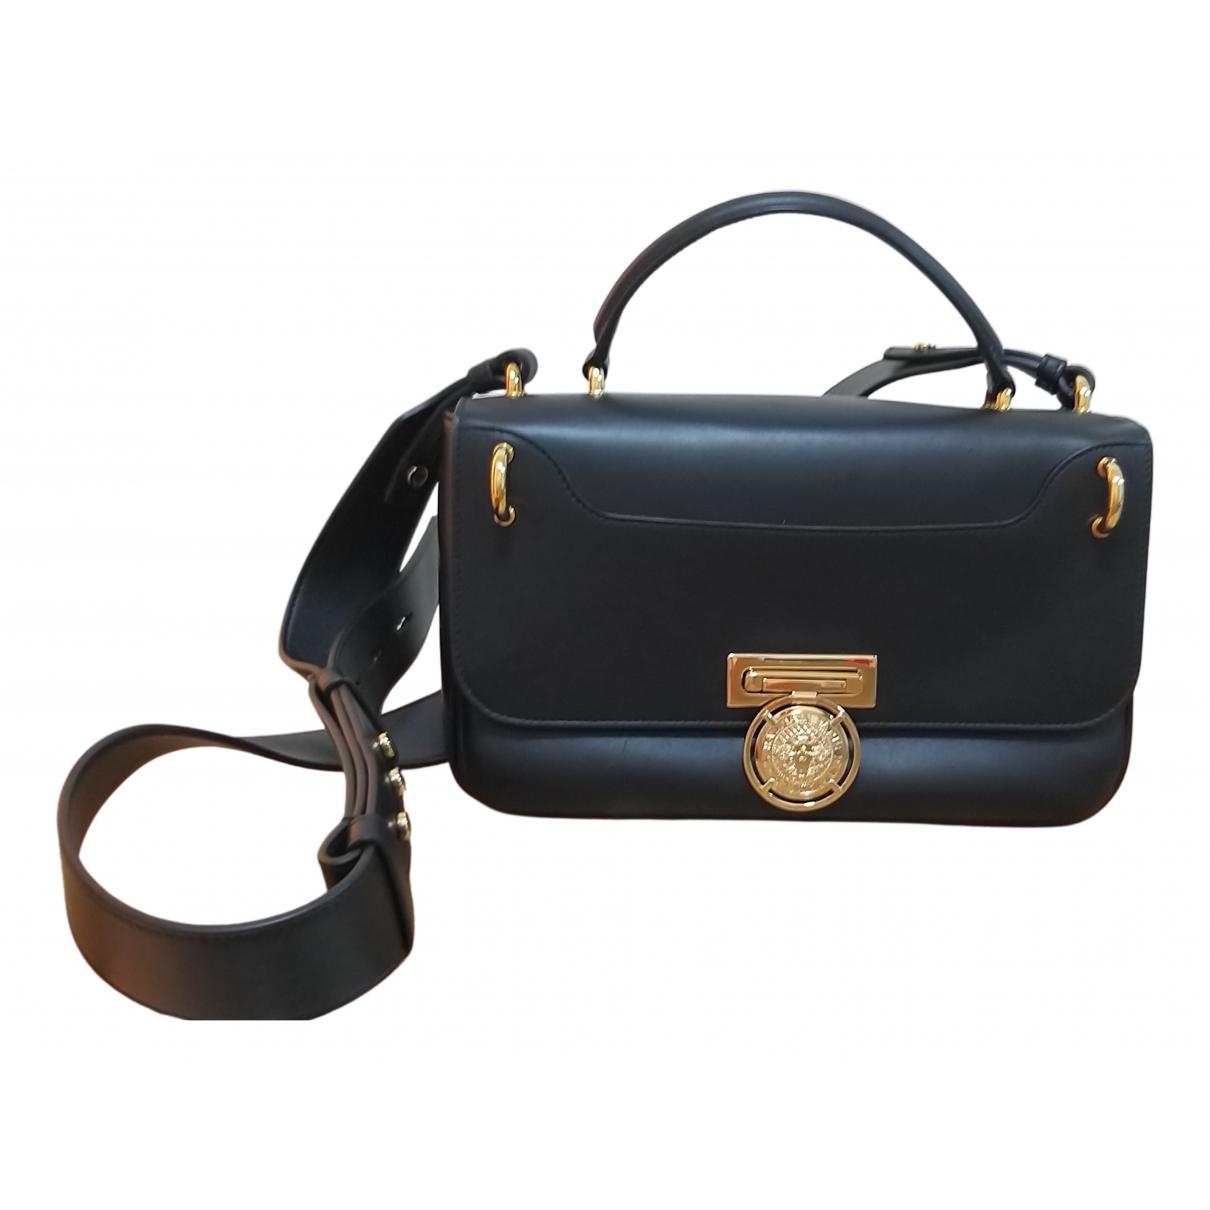 Balmain N Black Leather handbag for Women N